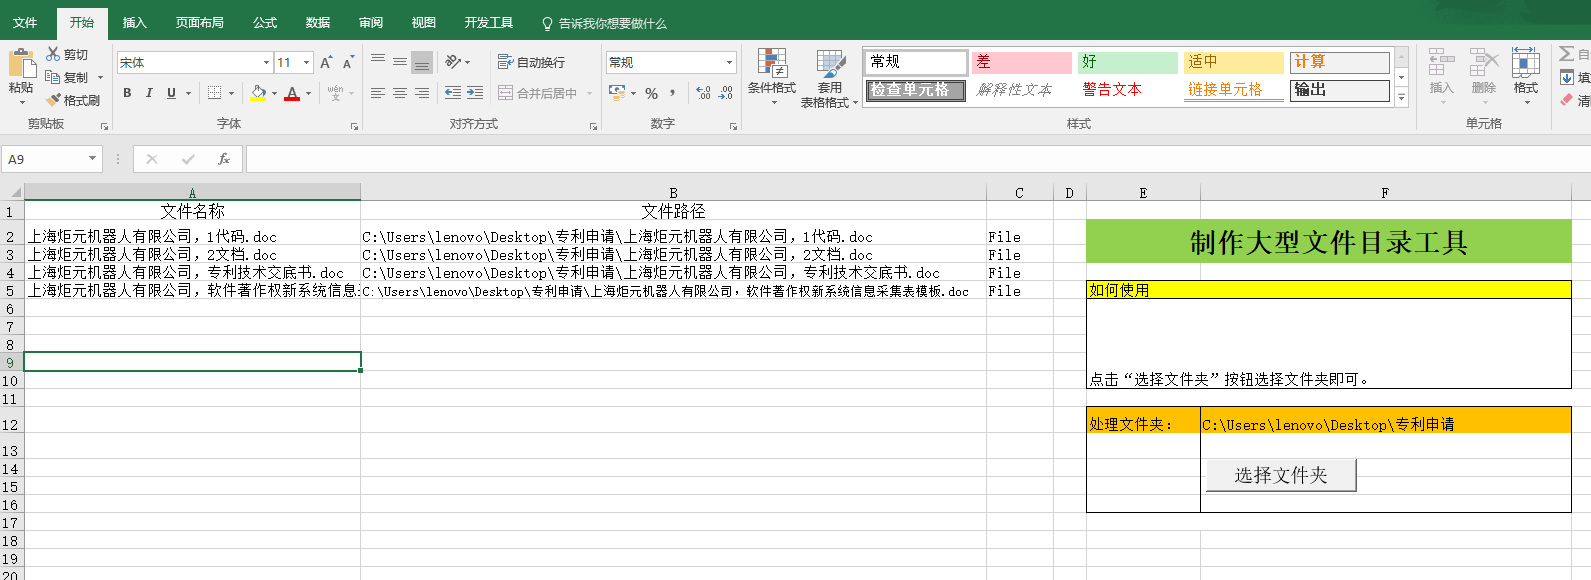 Excel文件批量智能文字查找替换招商,诚荐专业的上海炬元白领机器人